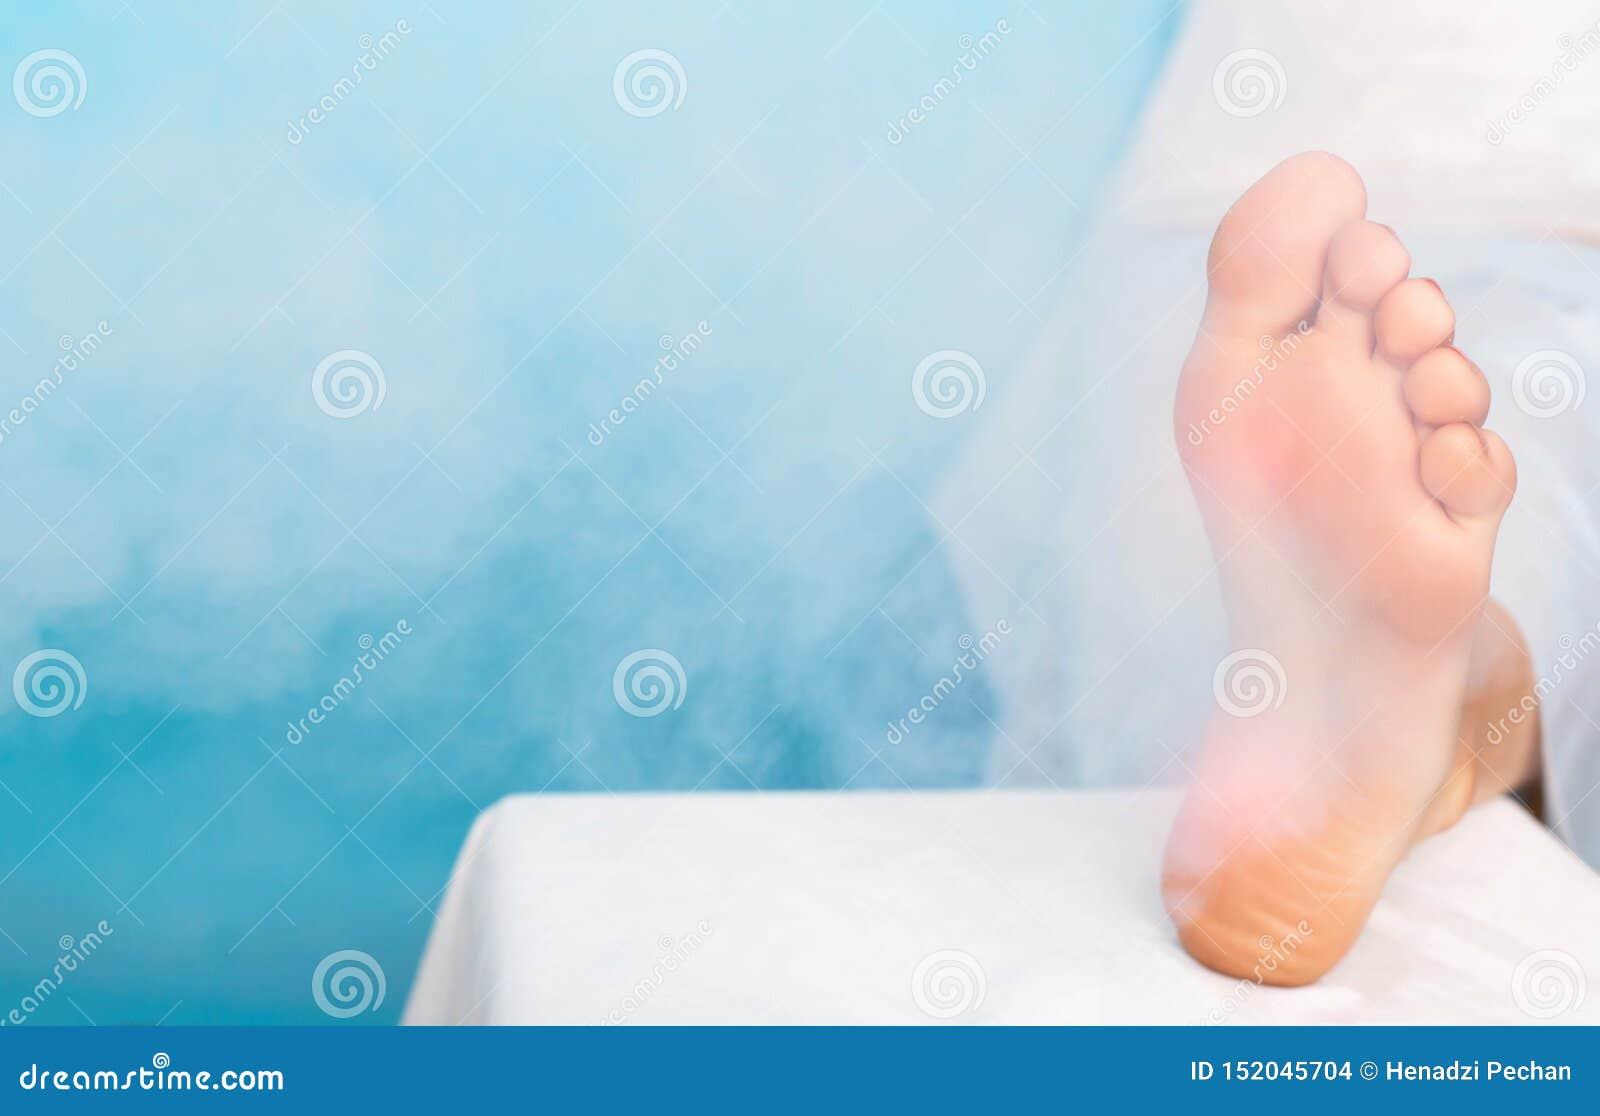 warts treatment dermatologist sta su to helminti